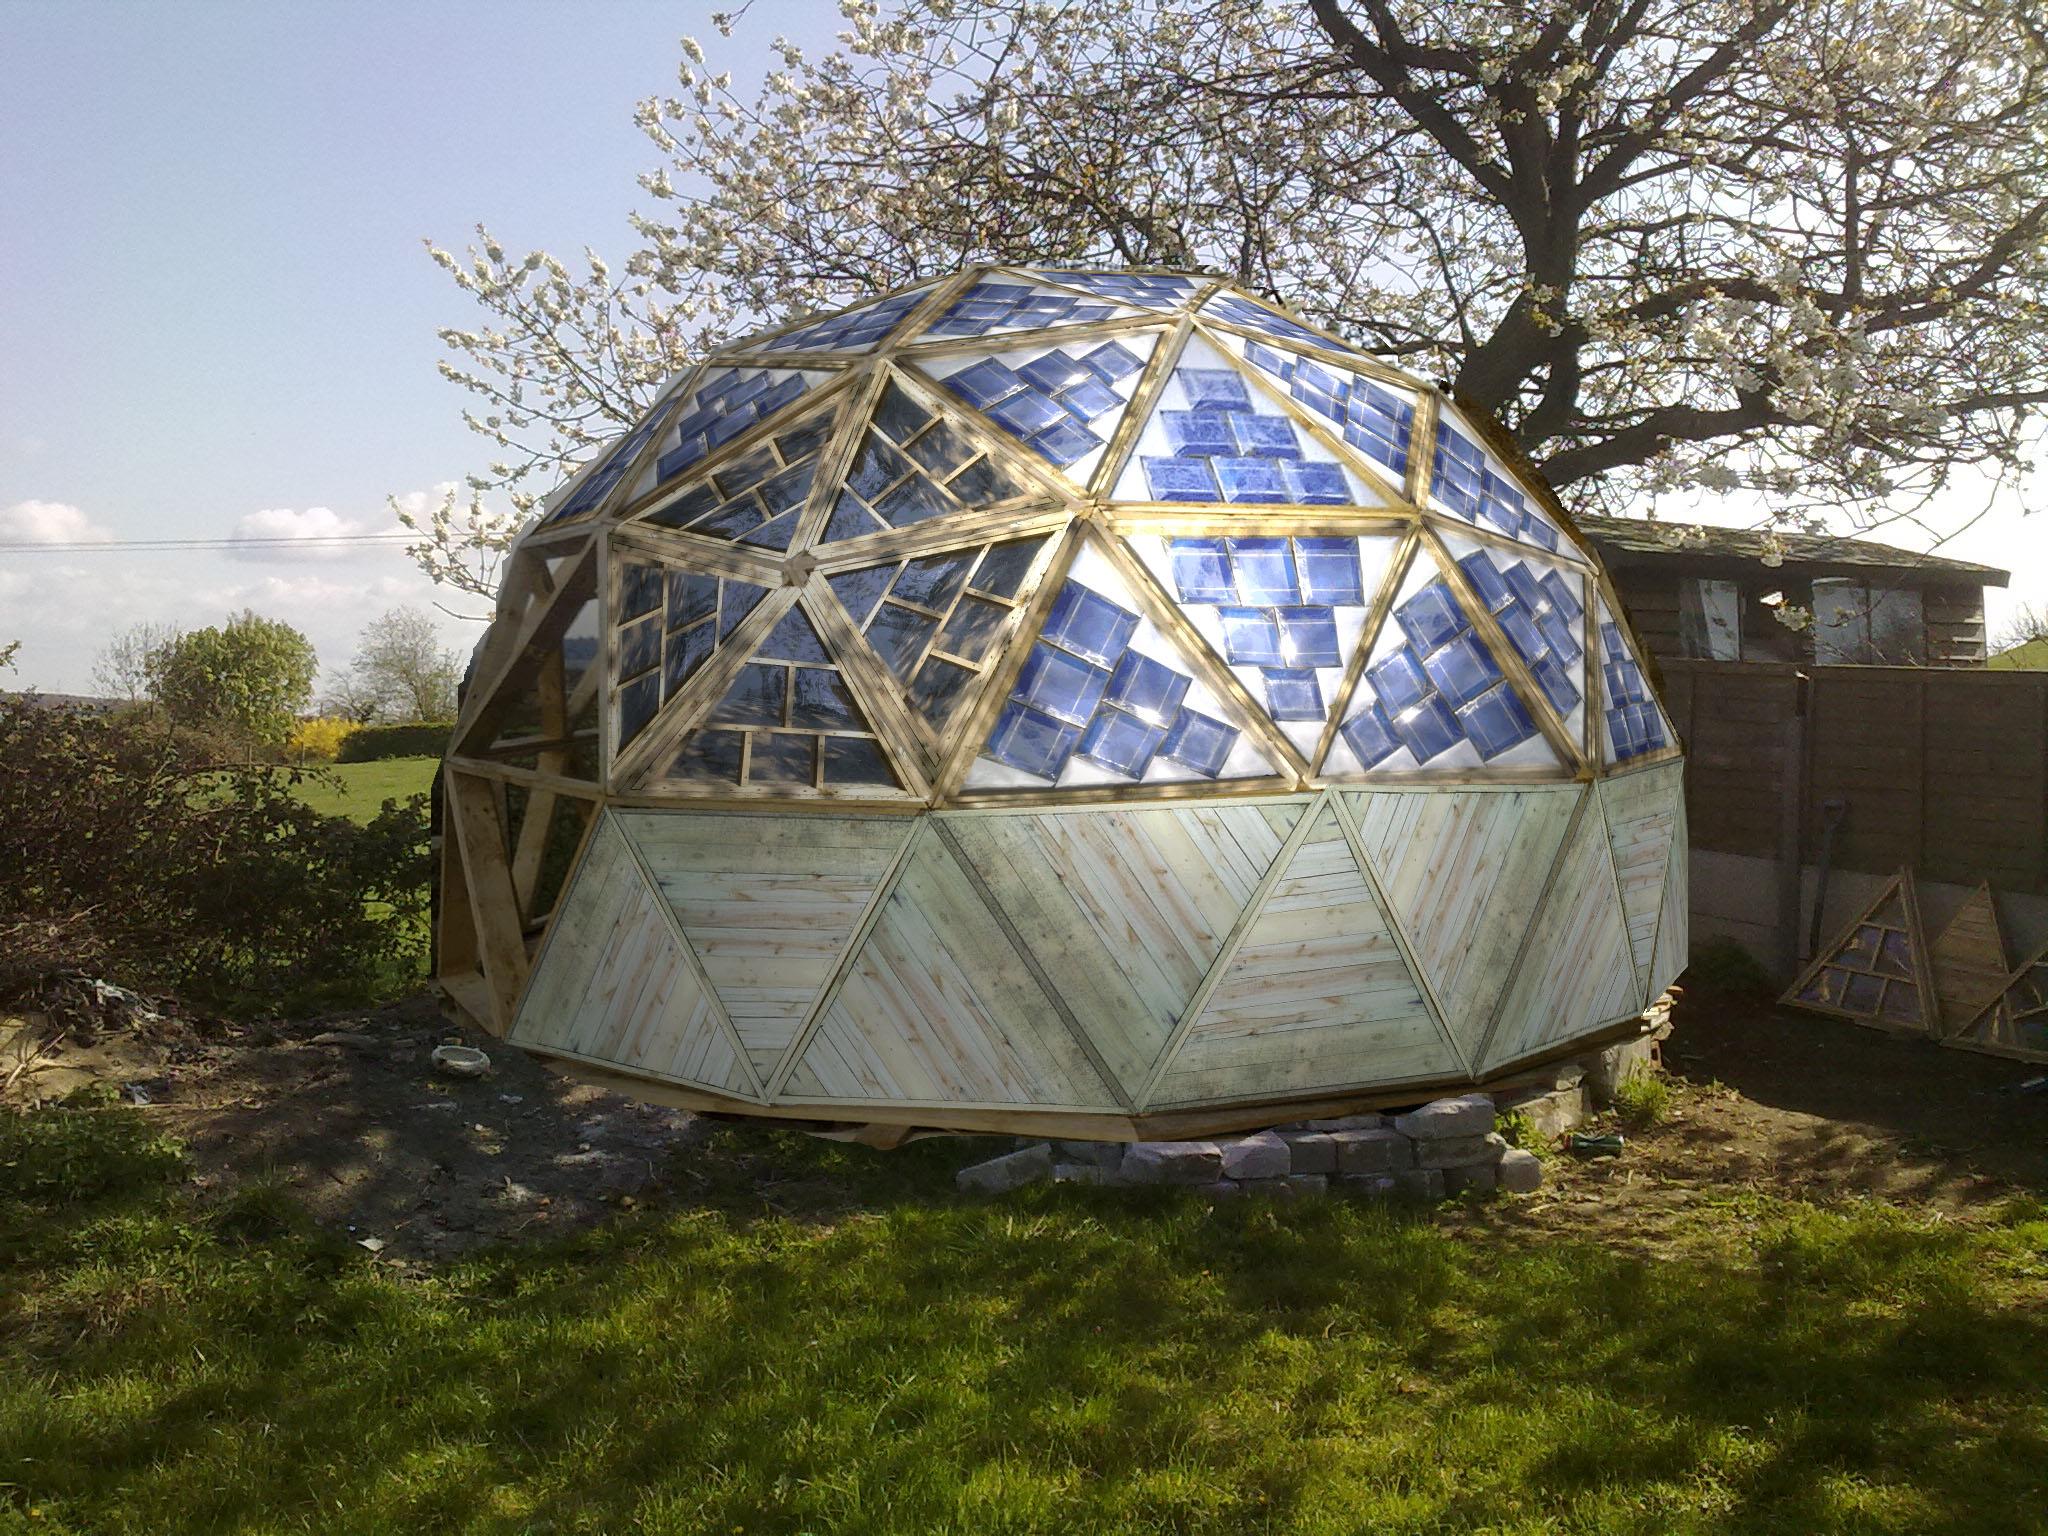 solar systems ahaped dome - photo #3